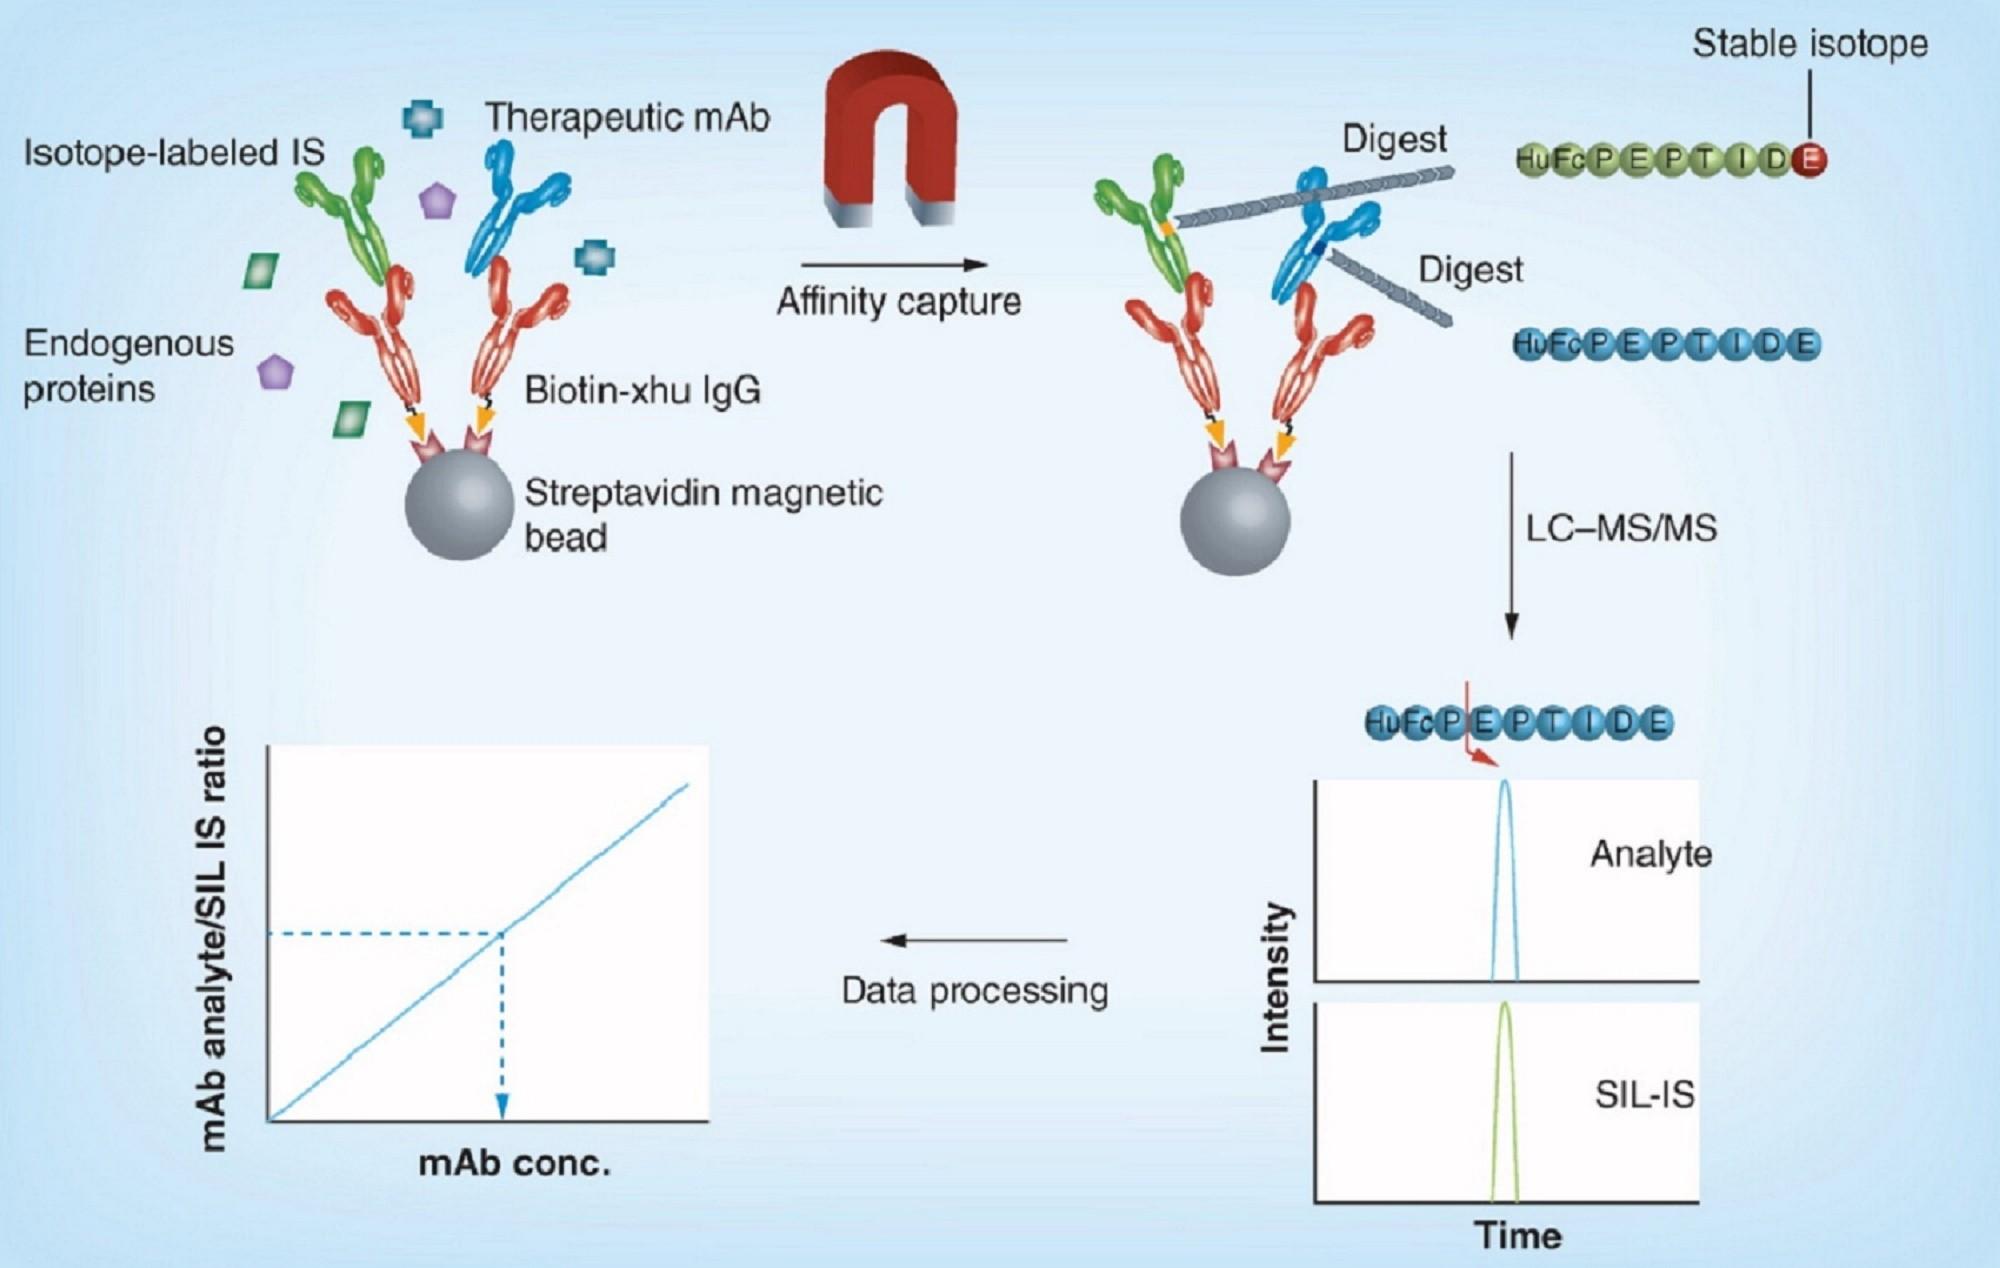 b - Validation of a biotherapeutic immunoaffinity article (8.15)